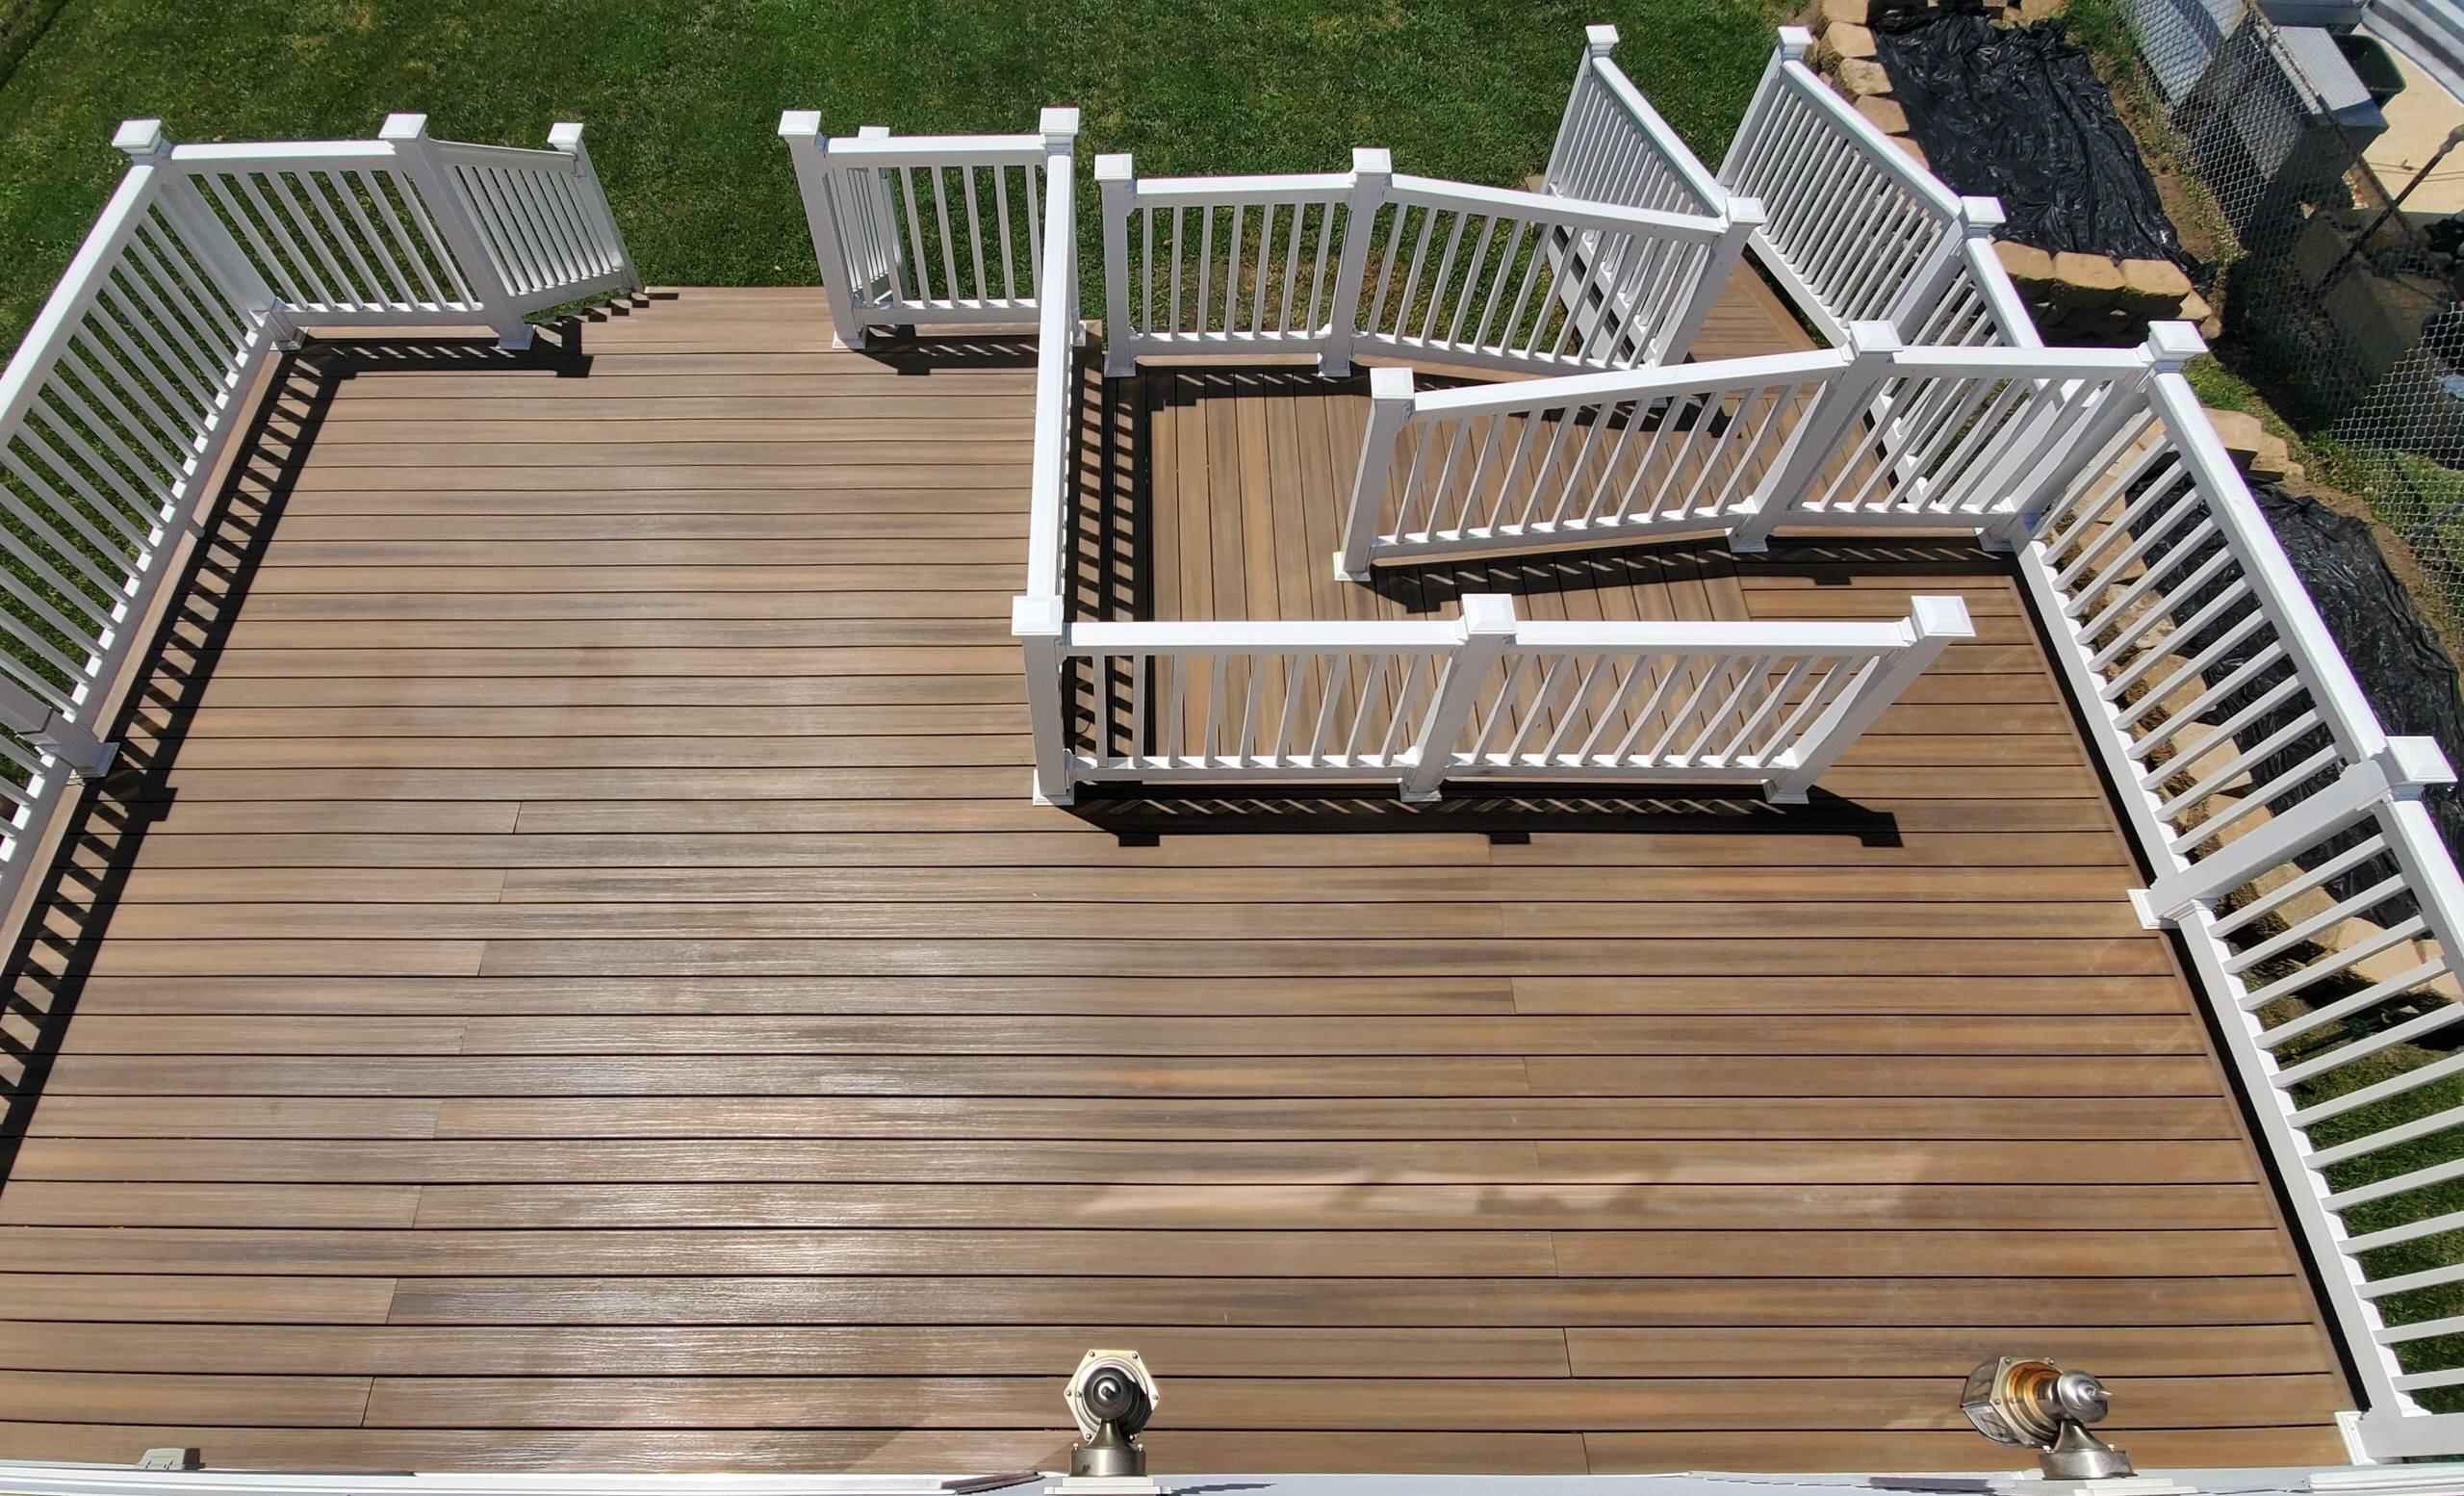 North Beach Composite Deck